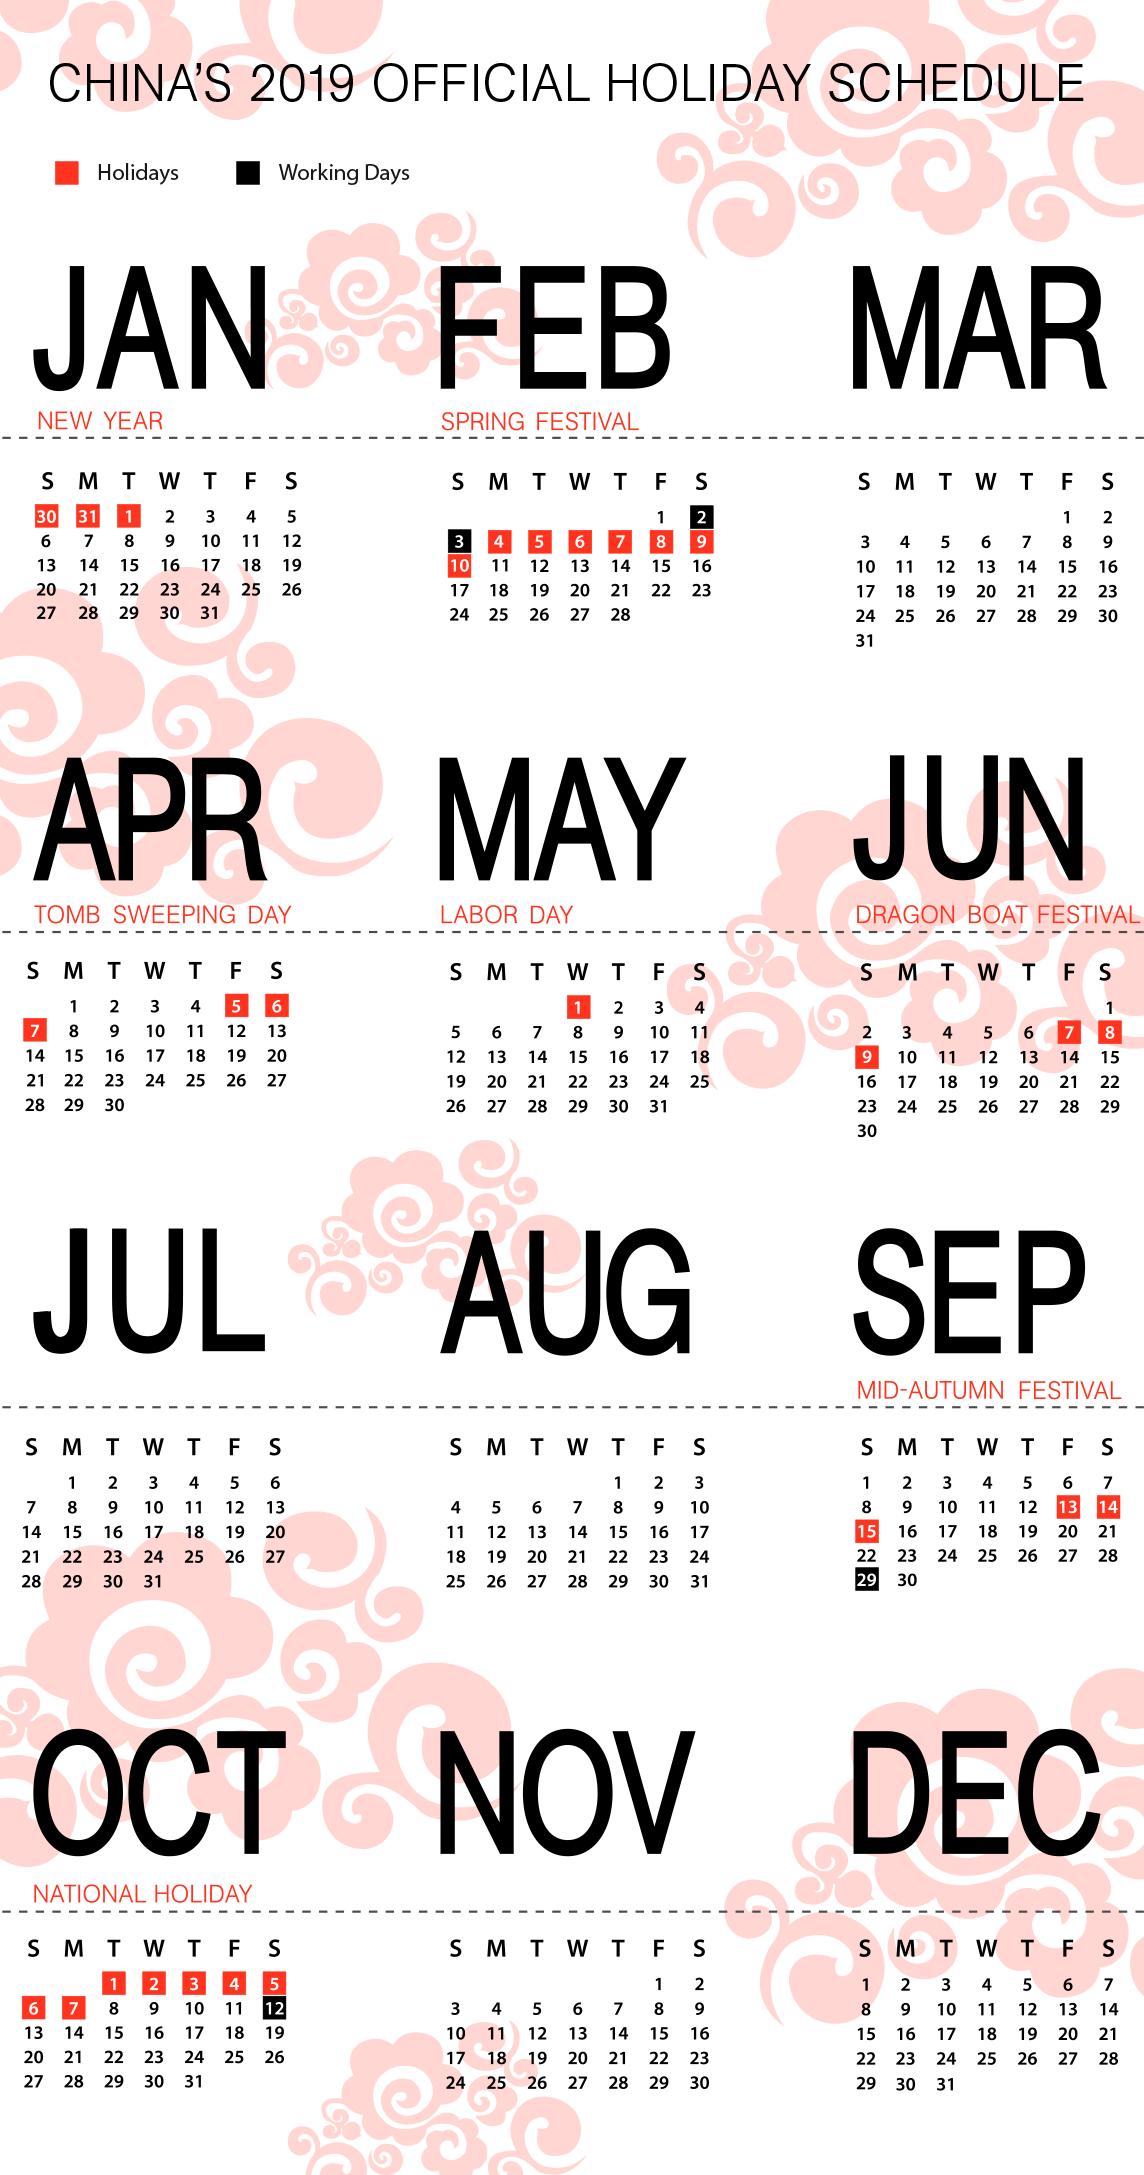 China's 2019 Official Holidays National holiday calendar